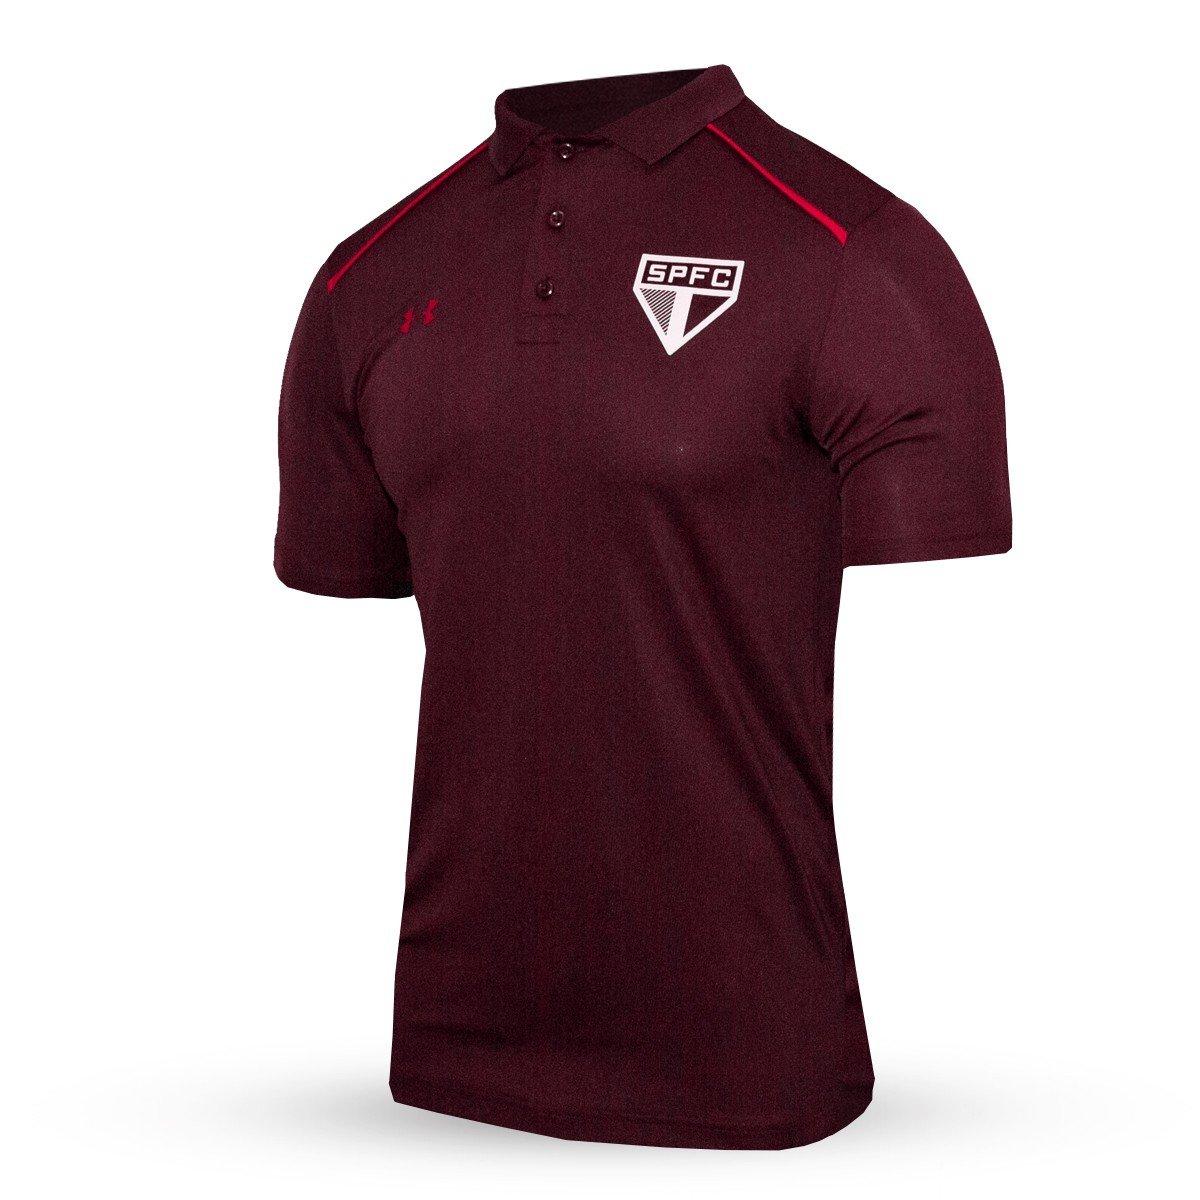 71ec6d6702 ... Camisa Polo Ua Sao Paulo Core 2017 18 - Compre Agora Netshoes  a787ed9ae68f34 ...